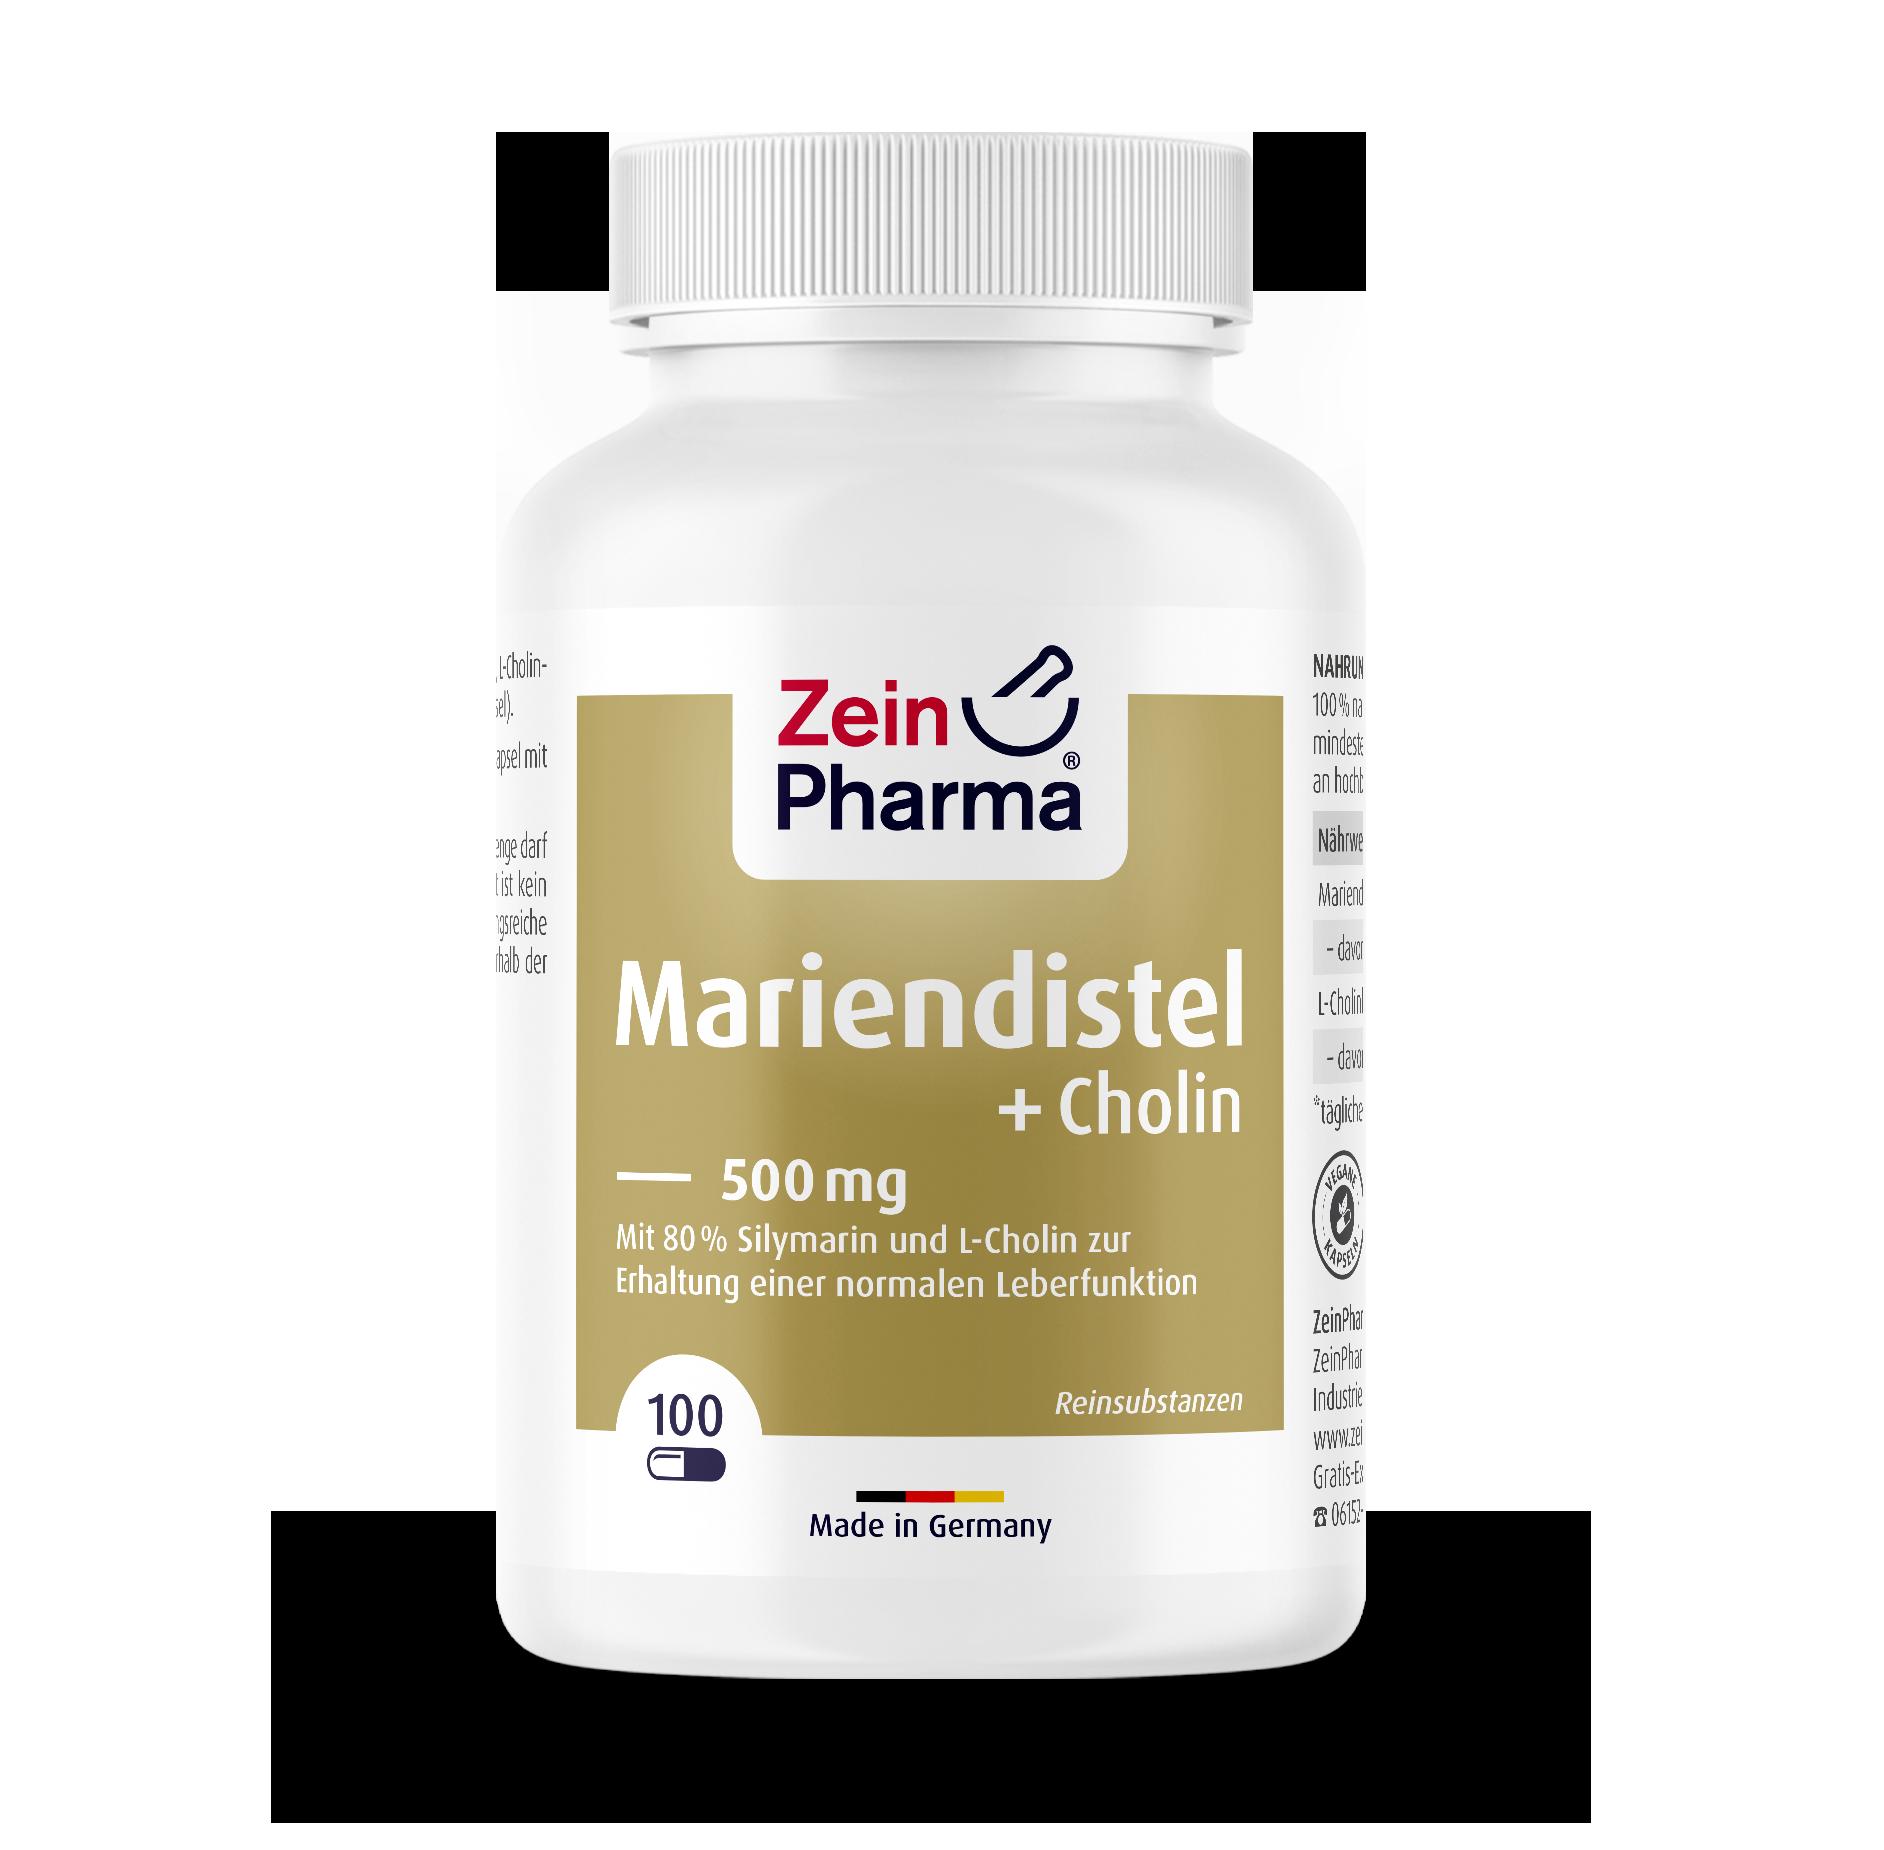 Mariendistel + Cholin Kapseln